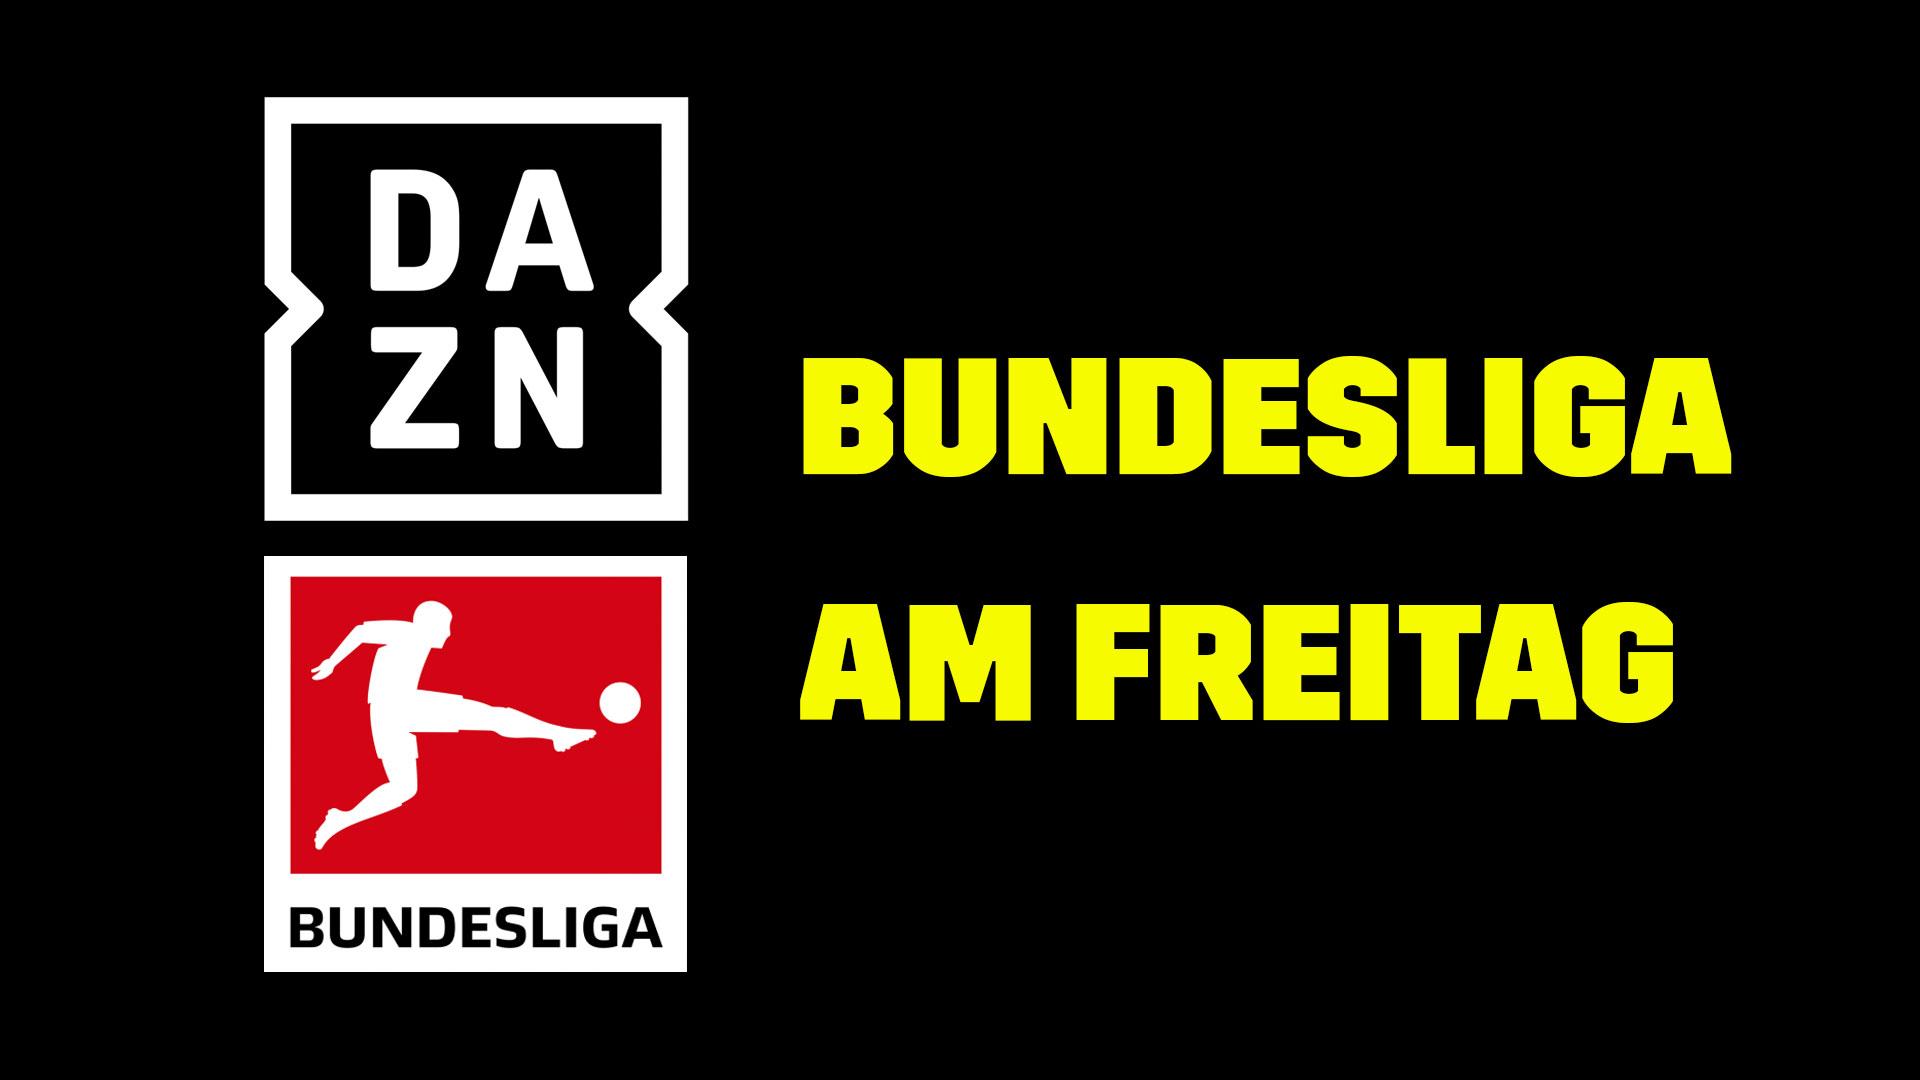 DAZN Bundesliga Freitag TV LIVE STREAM Übertragung